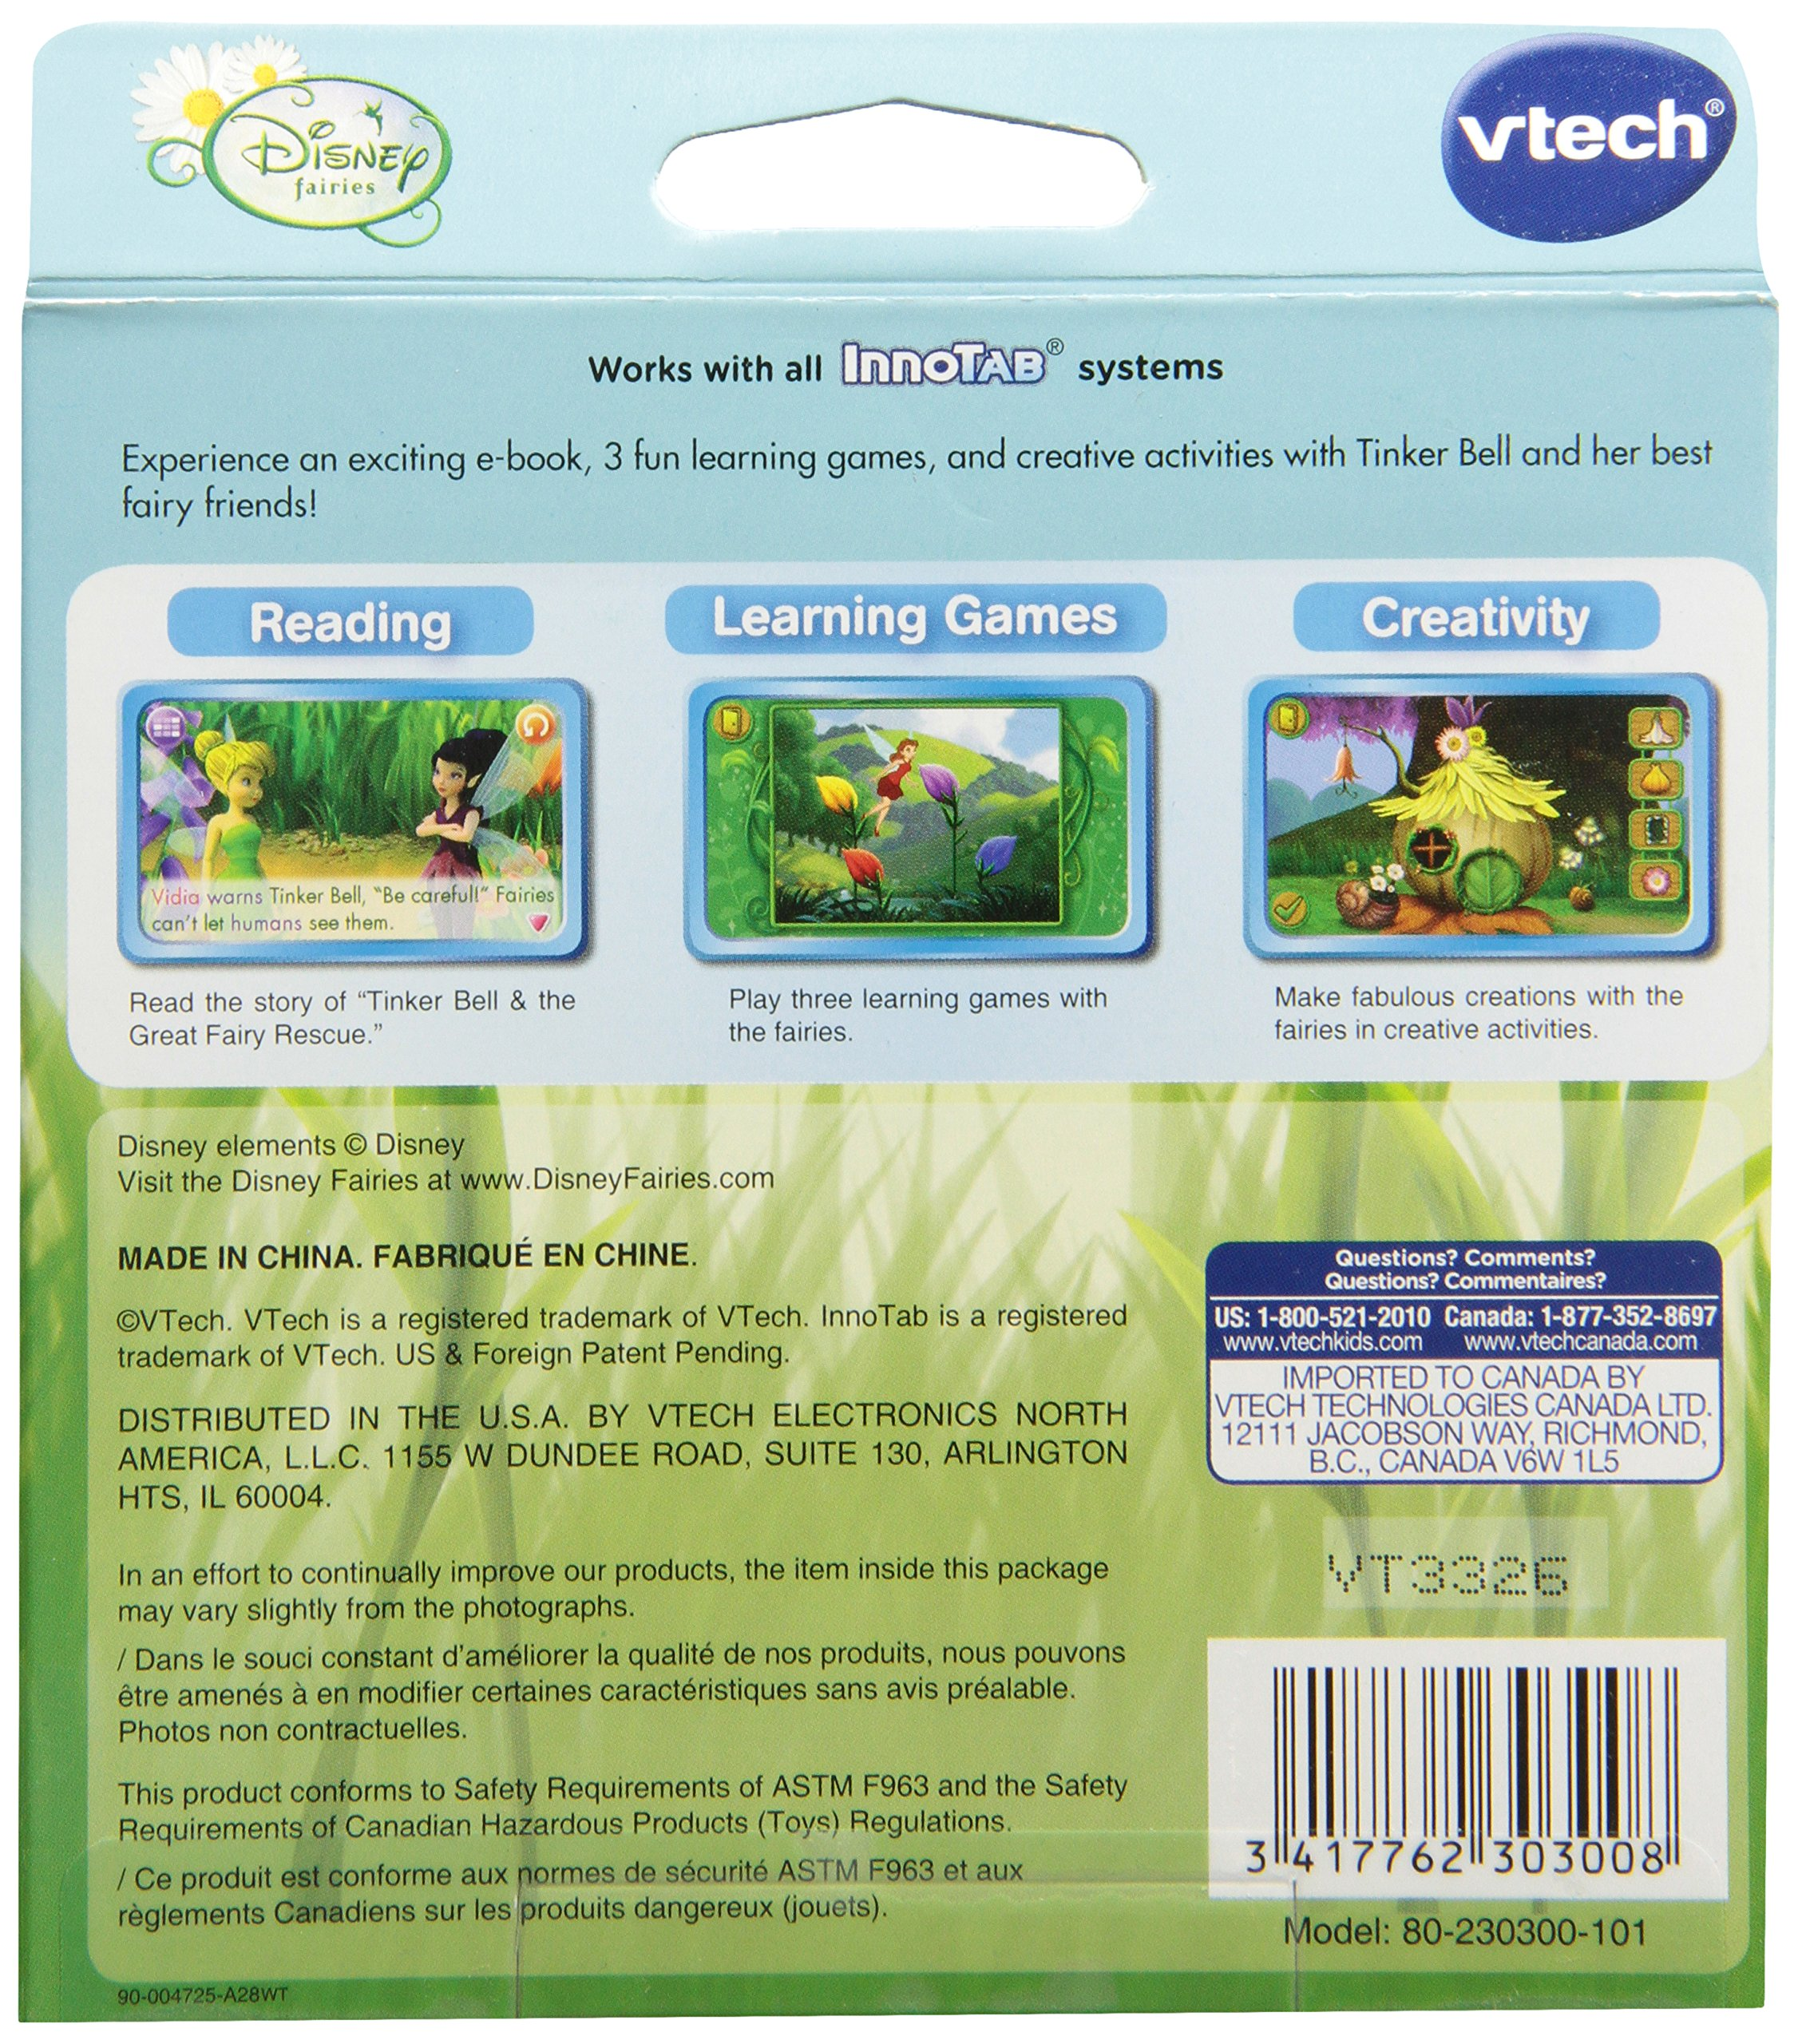 VTech - InnoTab Software - Disney Fairies by VTech (Image #2)